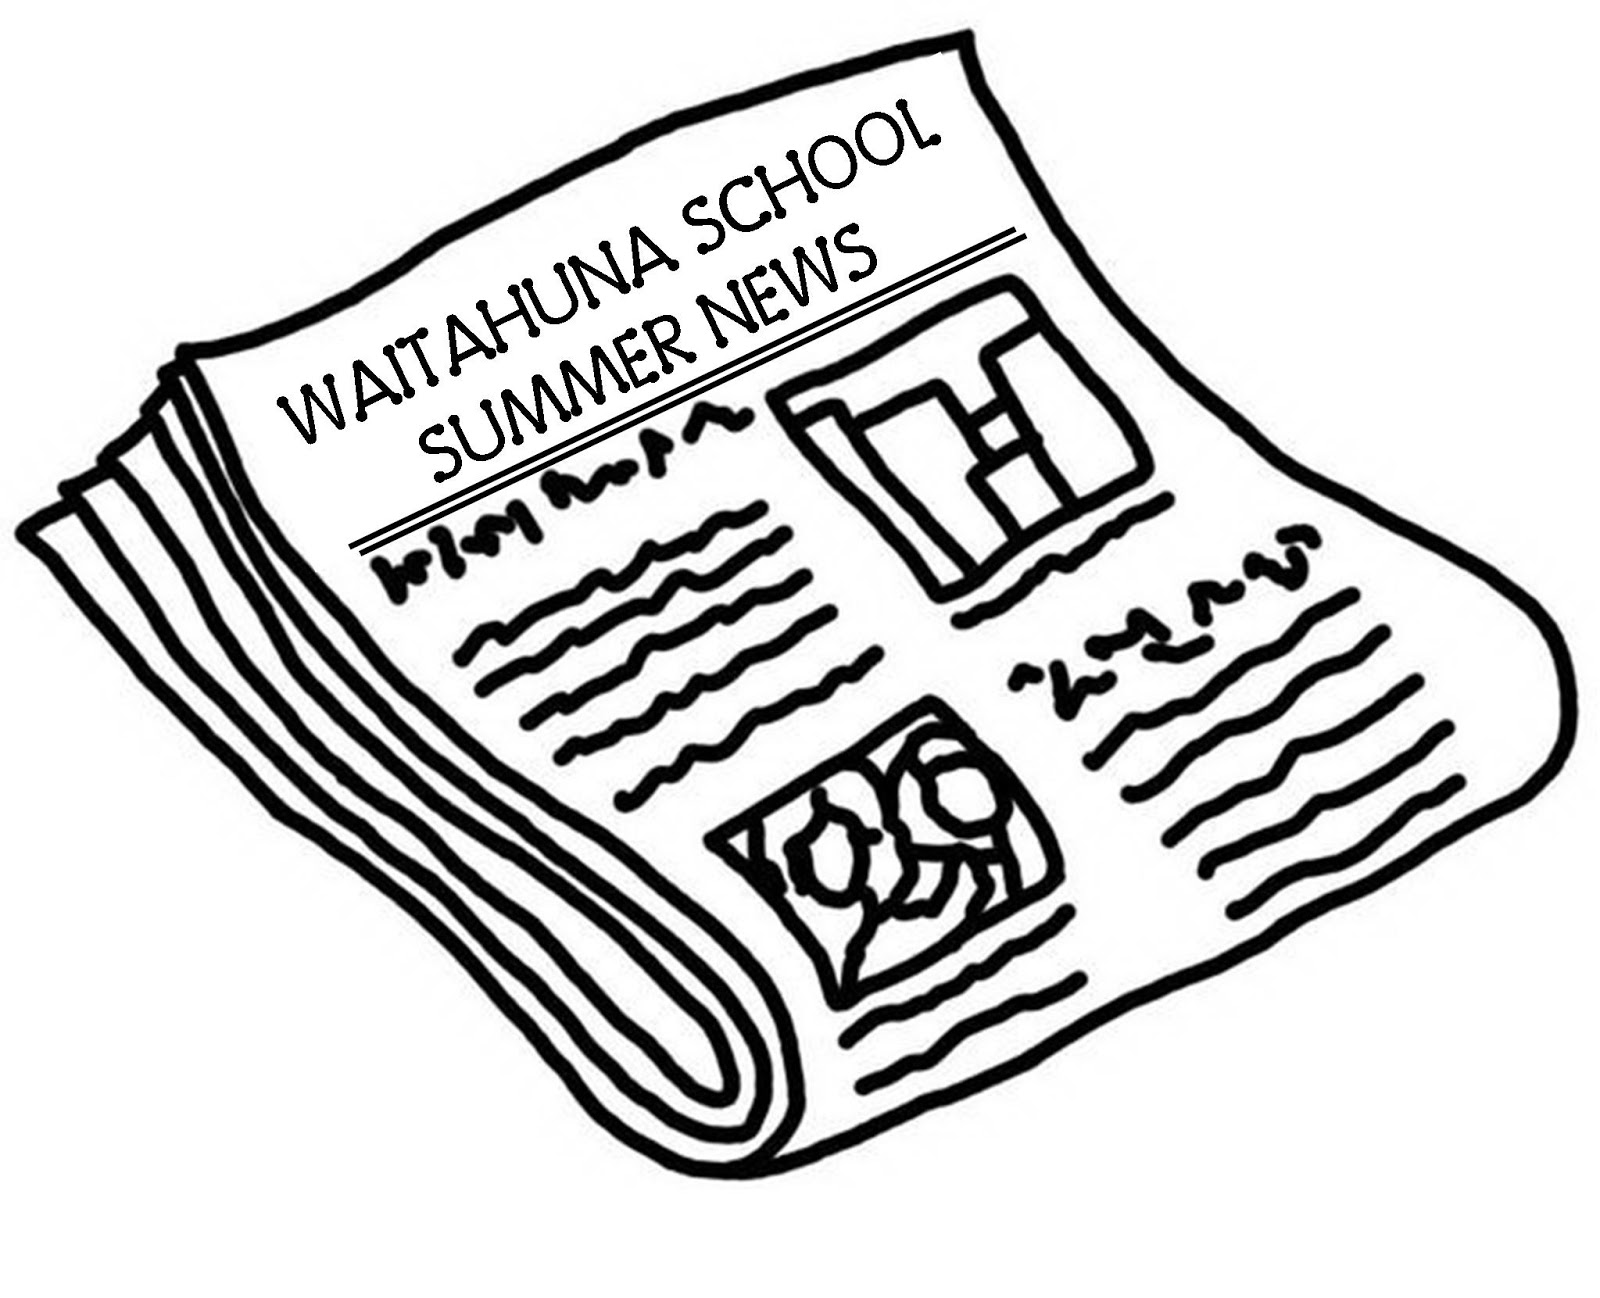 Newspaper clipart edition. Waitahuna school first of